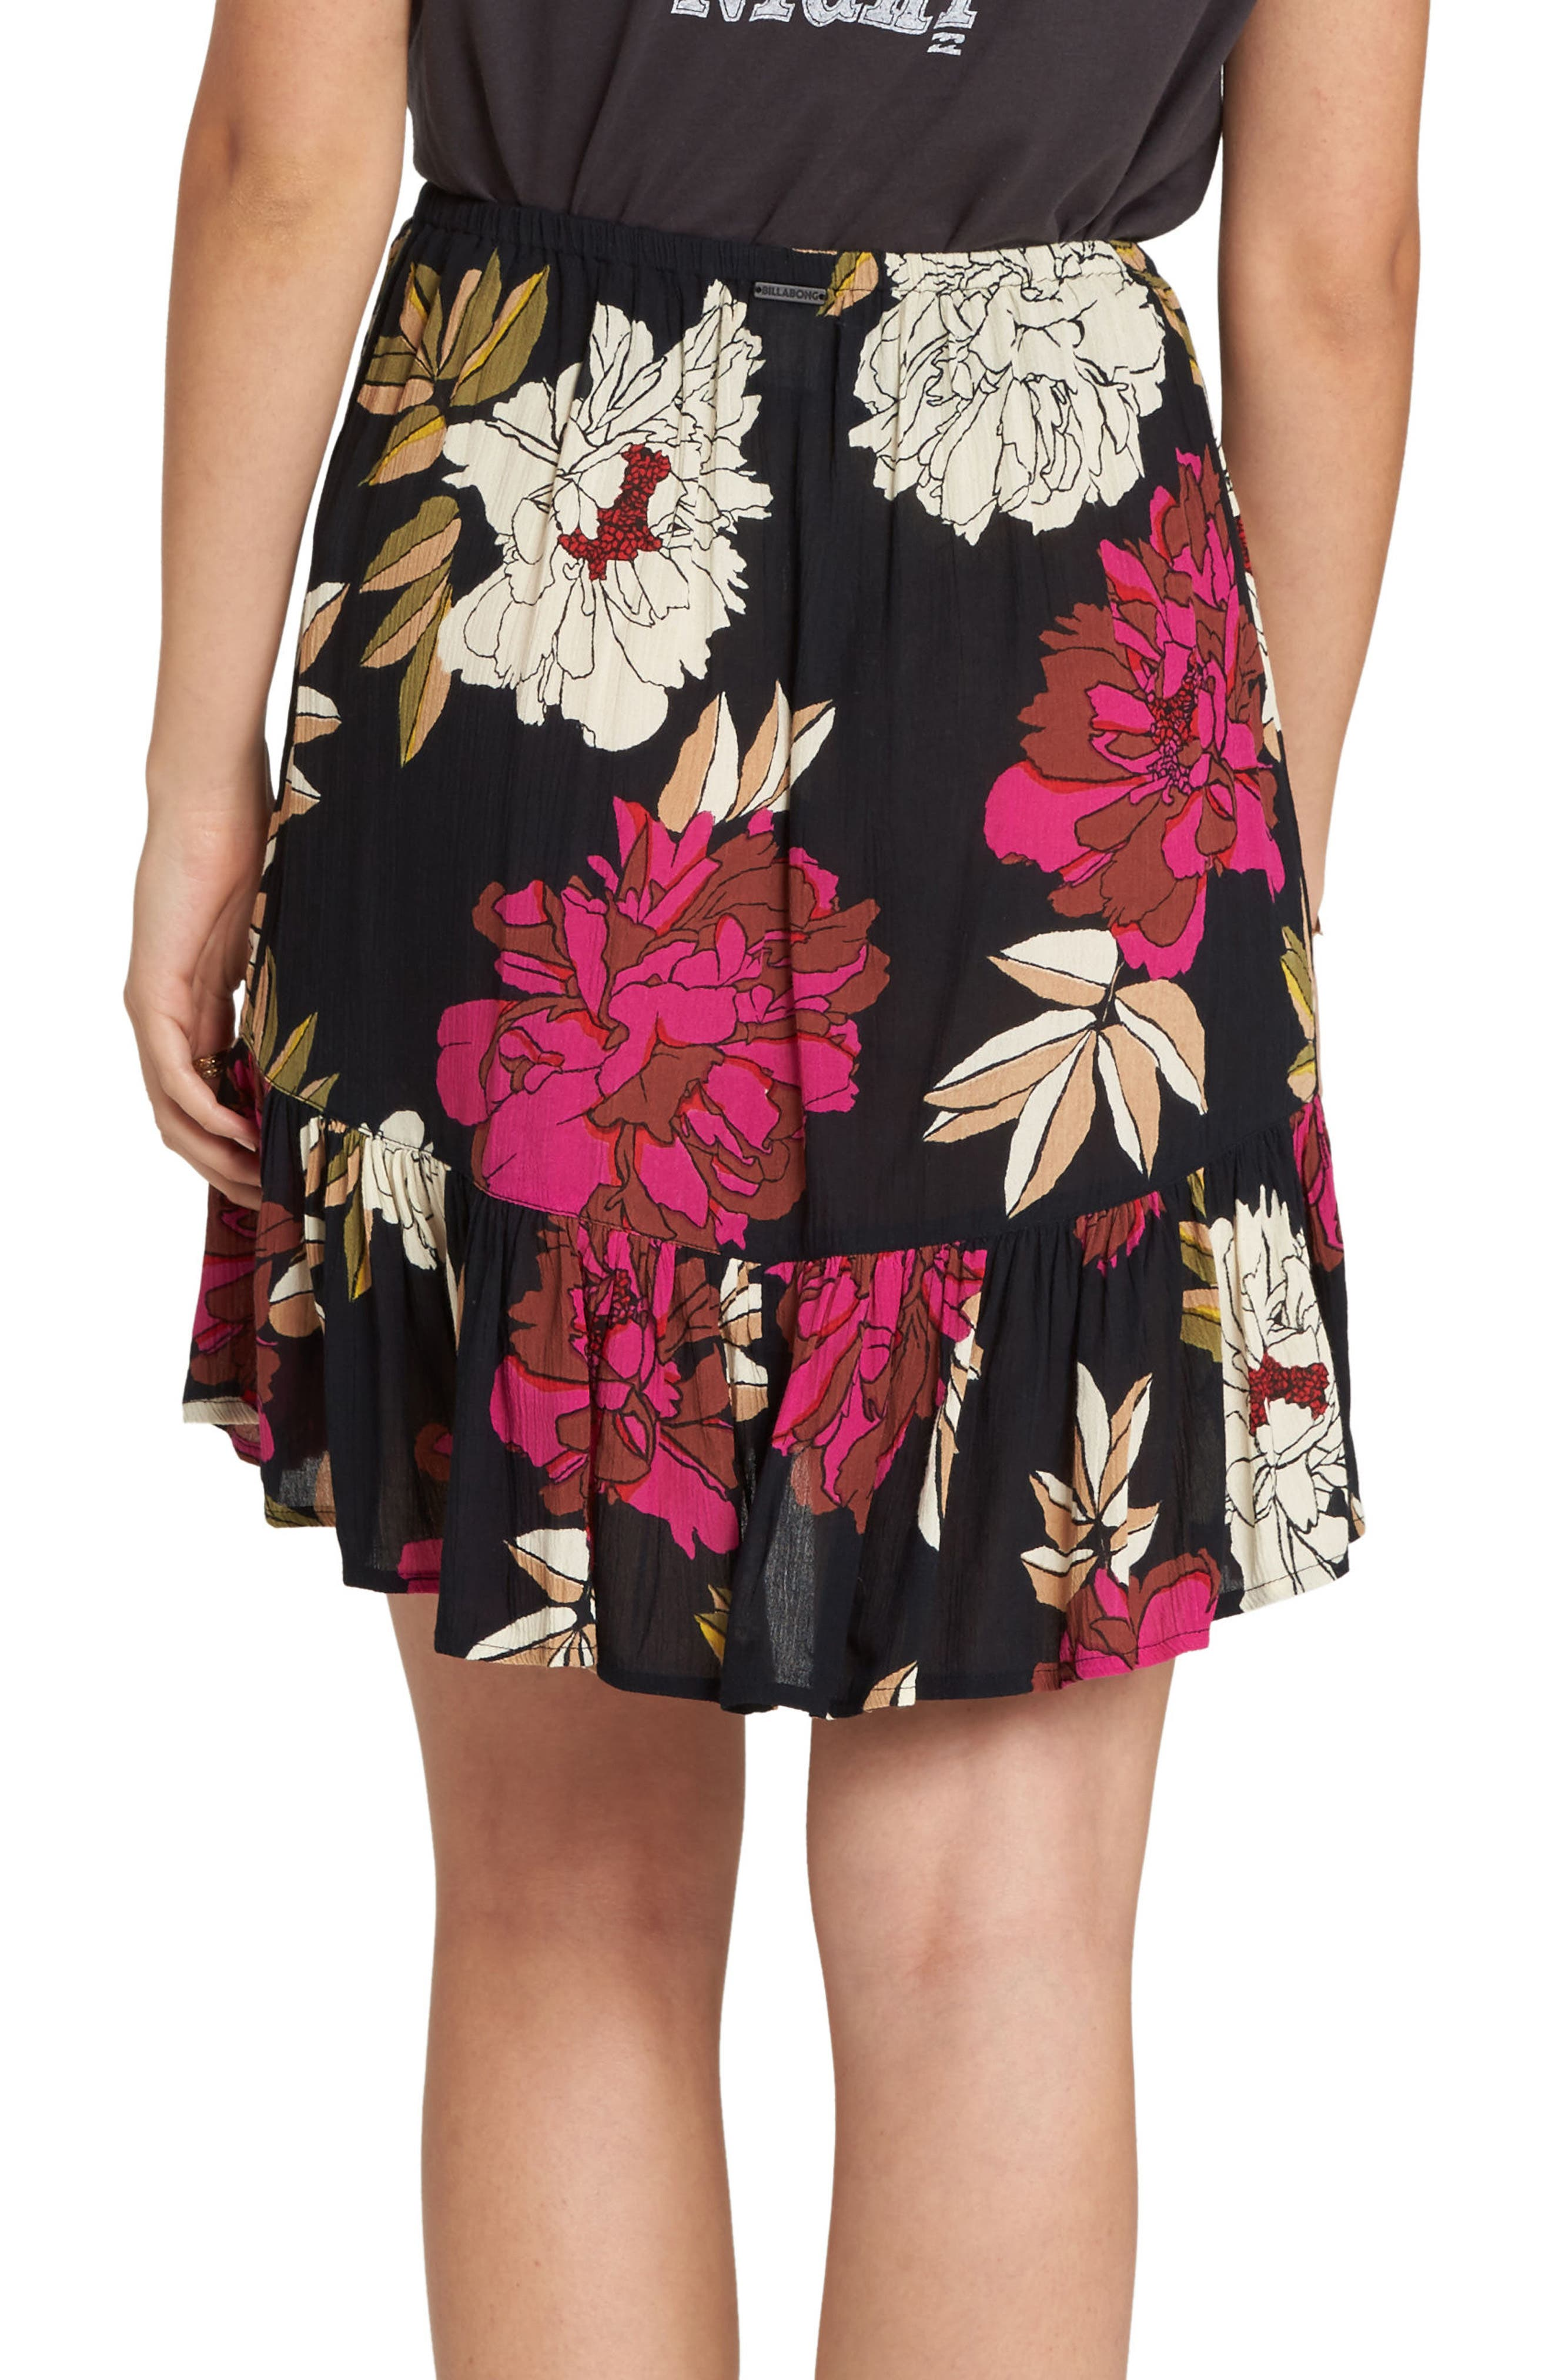 BILLABONG, For the Ride Floral Print Faux Wrap Skirt, Alternate thumbnail 2, color, 001